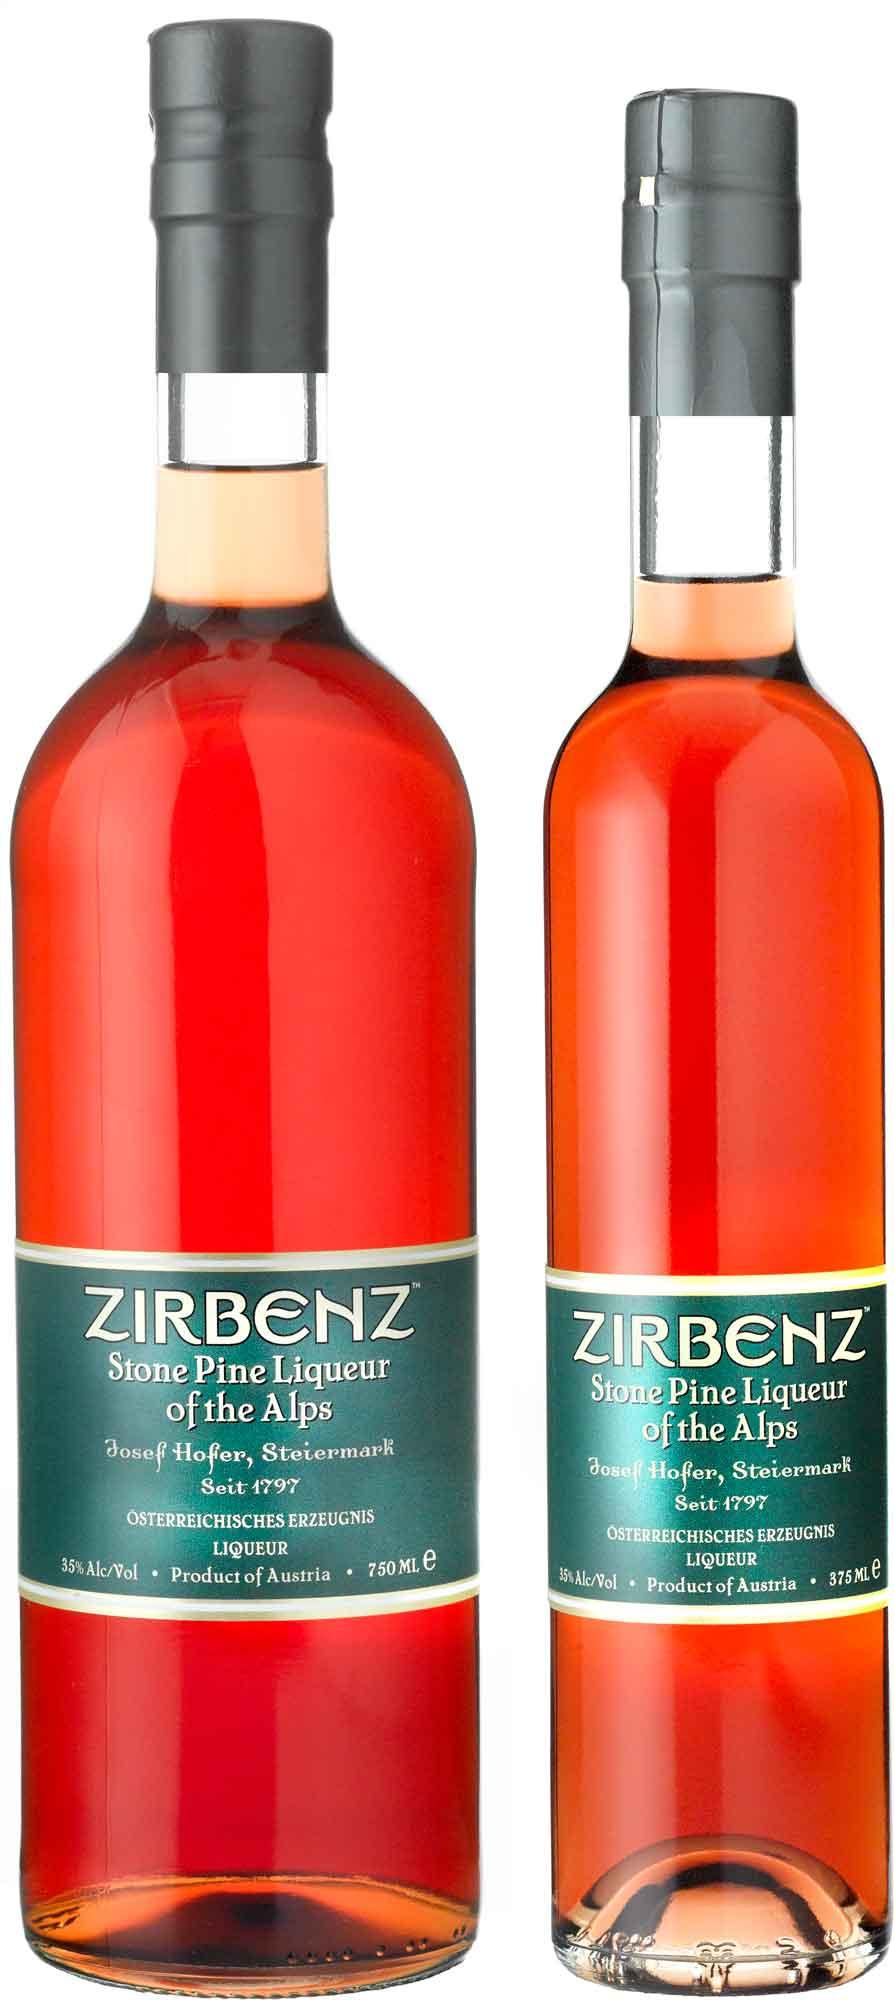 Zirbenz Stone Pine Liqueur of the Alps